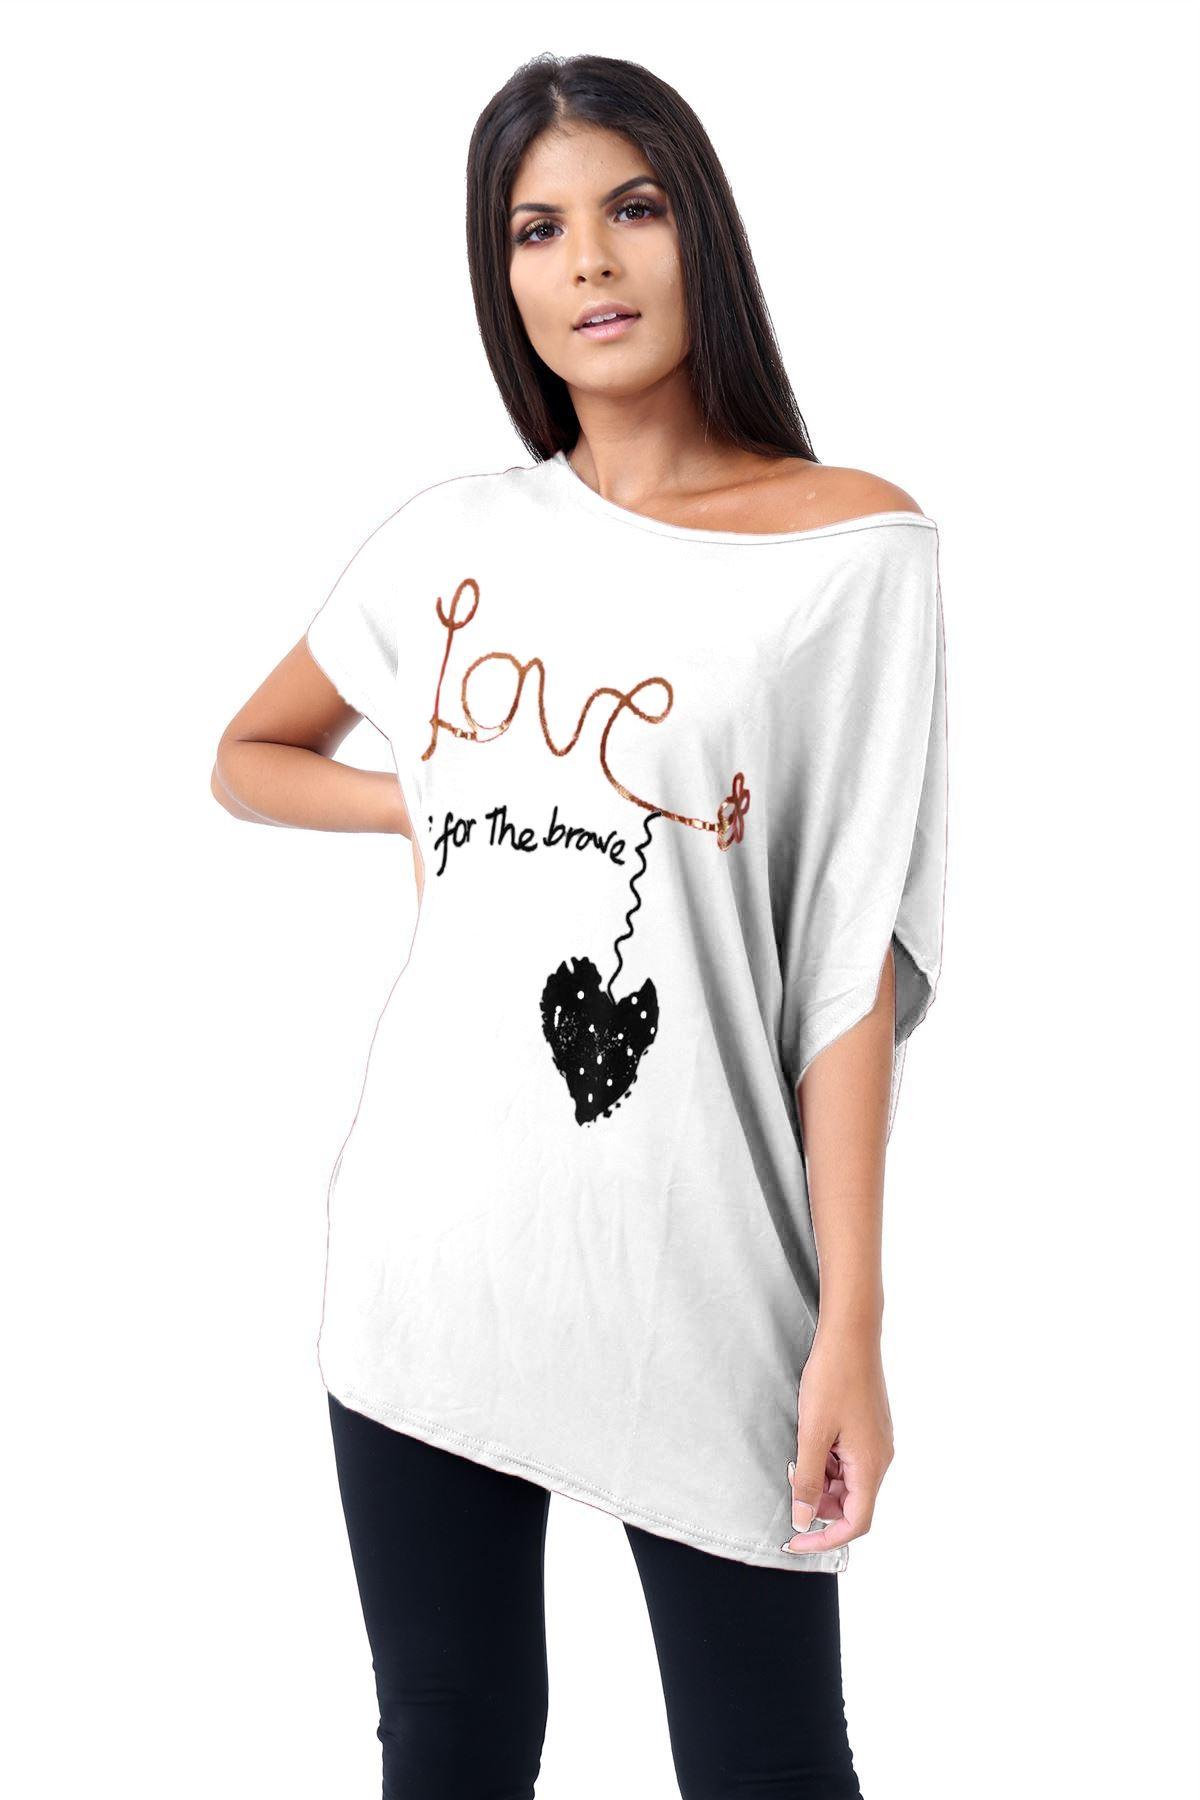 Plus-Size-Womens-Batwing-Sleeve-Printed-Off-Shoulder-Bardot-Oversize-T-Shirt-Top thumbnail 16